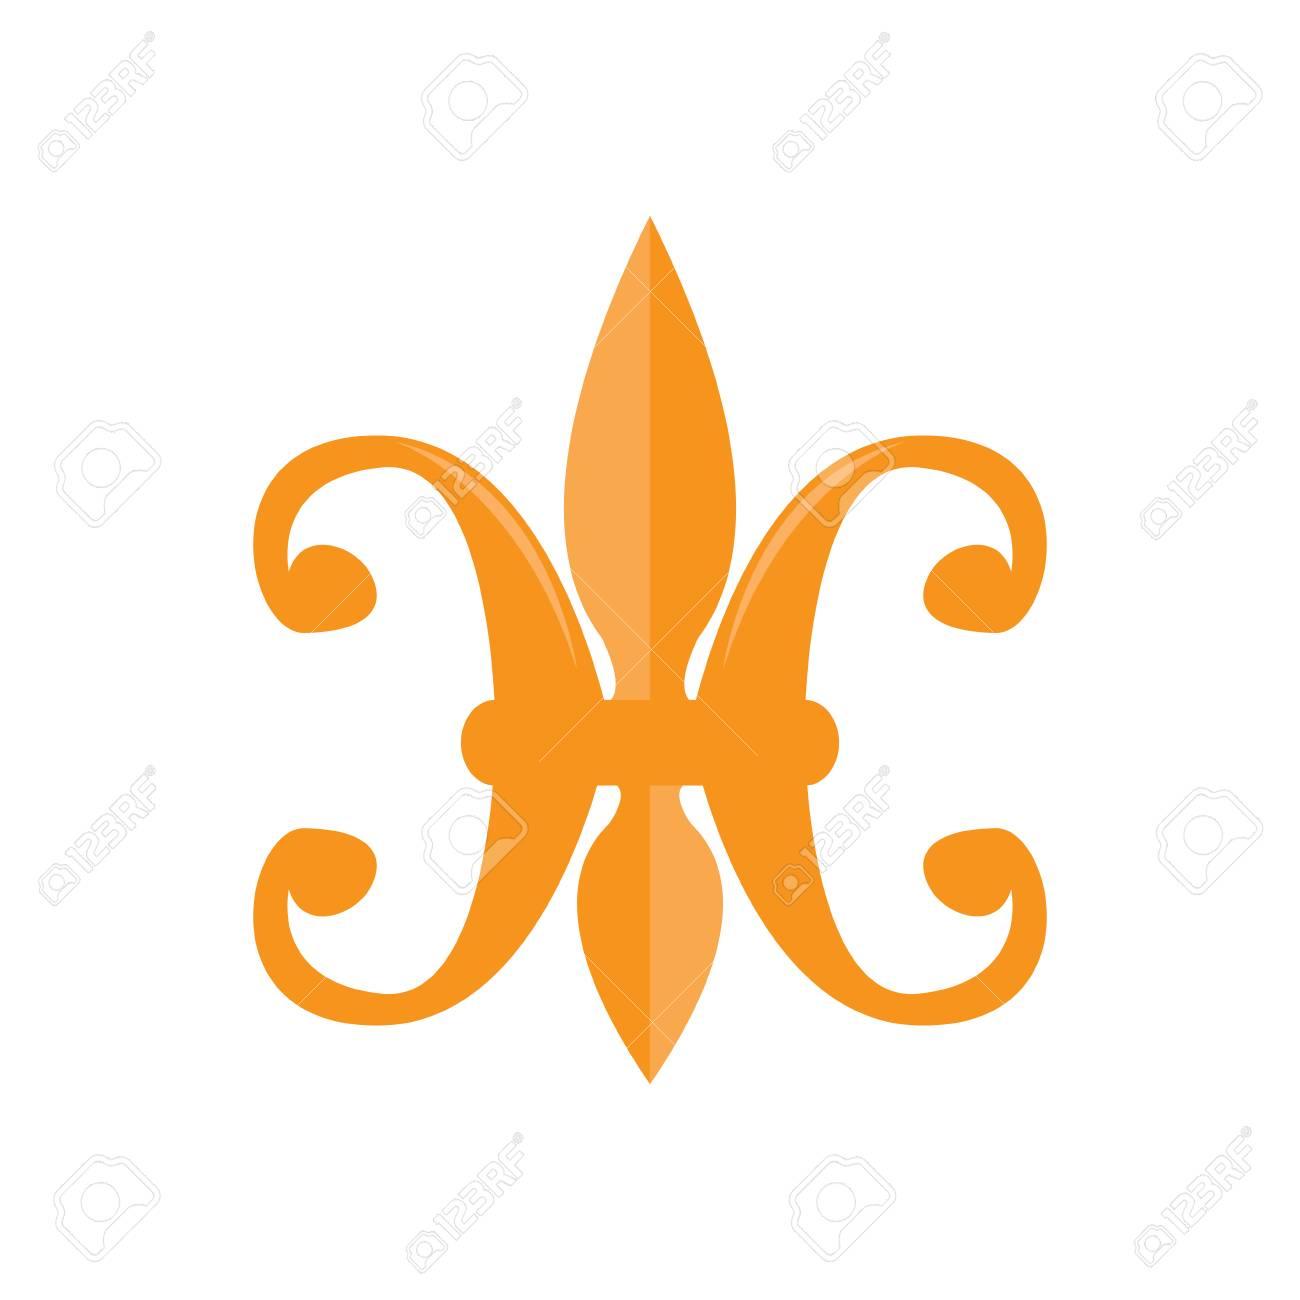 Fleur Illustration mardi gras symbol. fleur de lys. vector illustration design royalty